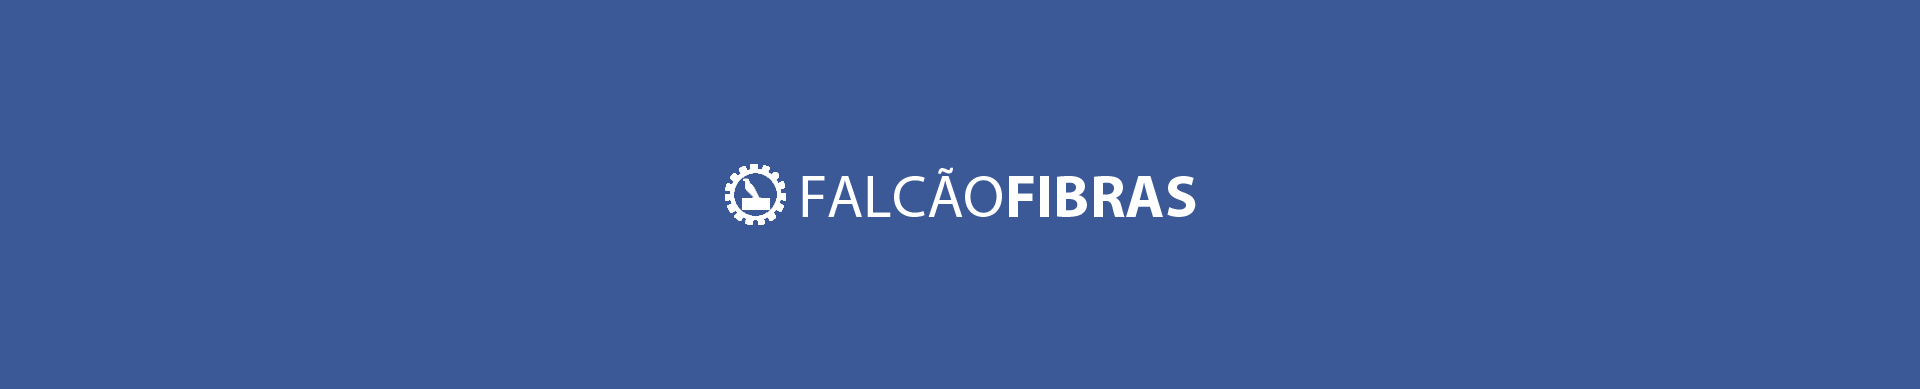 Falcão Fibras – Fios Poliamida / Polyamide Yarn   Fios Poliéster / Polyester Yarn   Meias e Collants / Socks and  Tights  Header